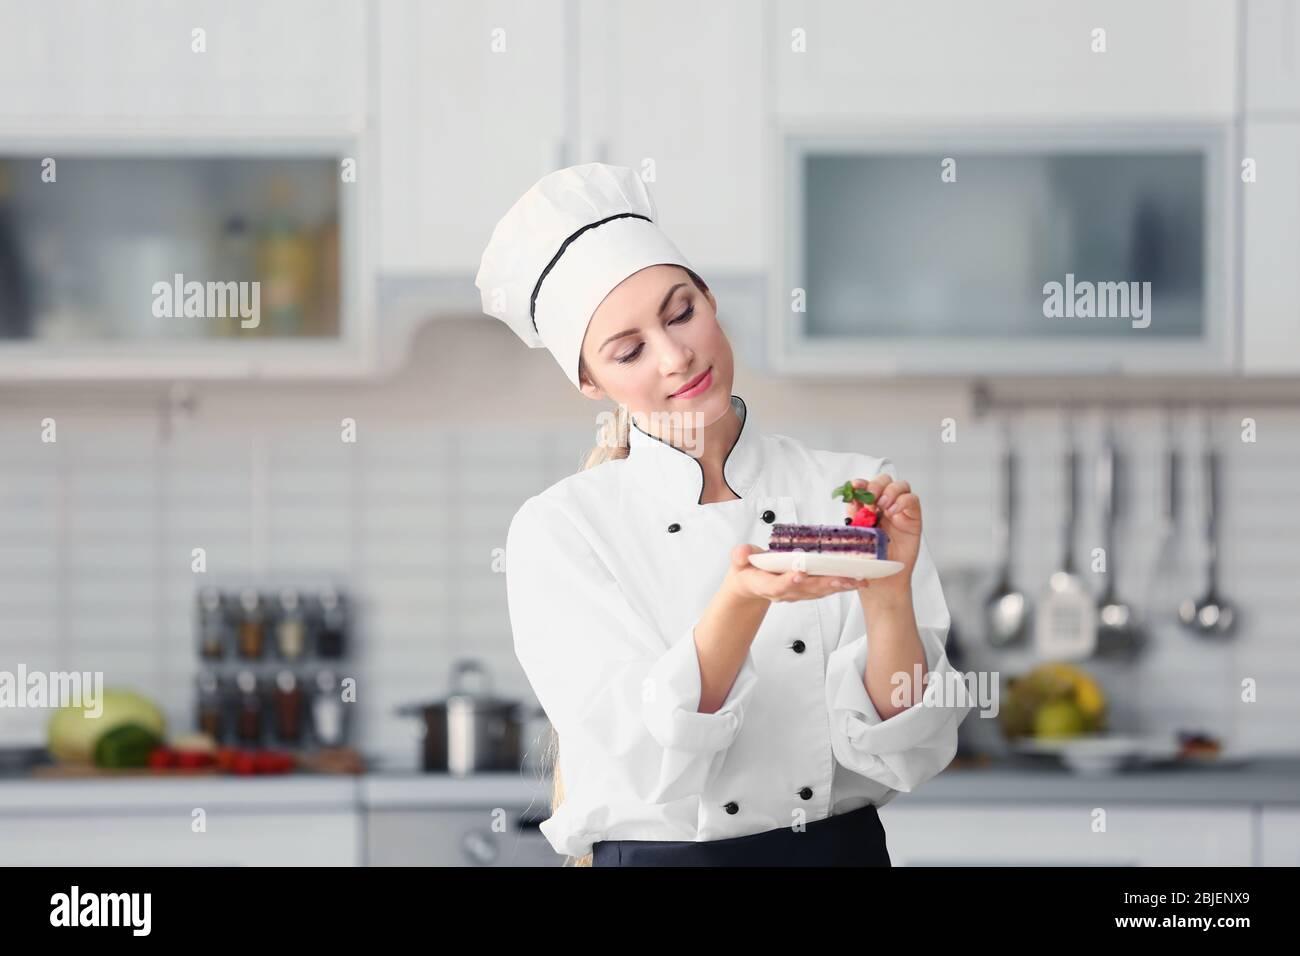 Female Chef Decorating Cake In Kitchen Stock Photo Alamy